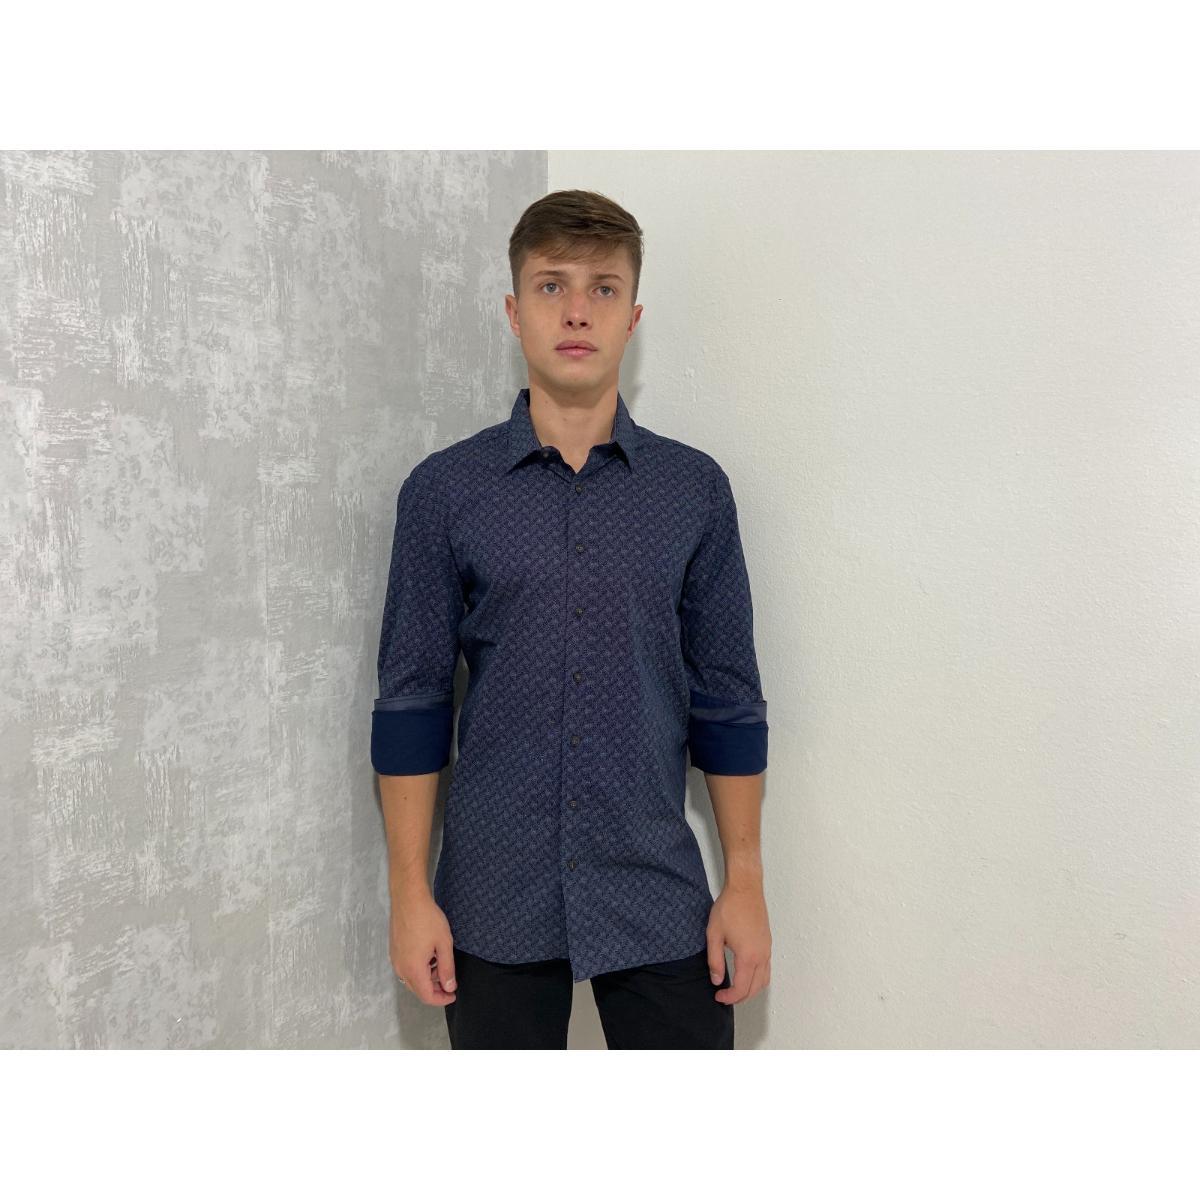 Camisa Masculina Individual 53.02.0558 94 Estampado